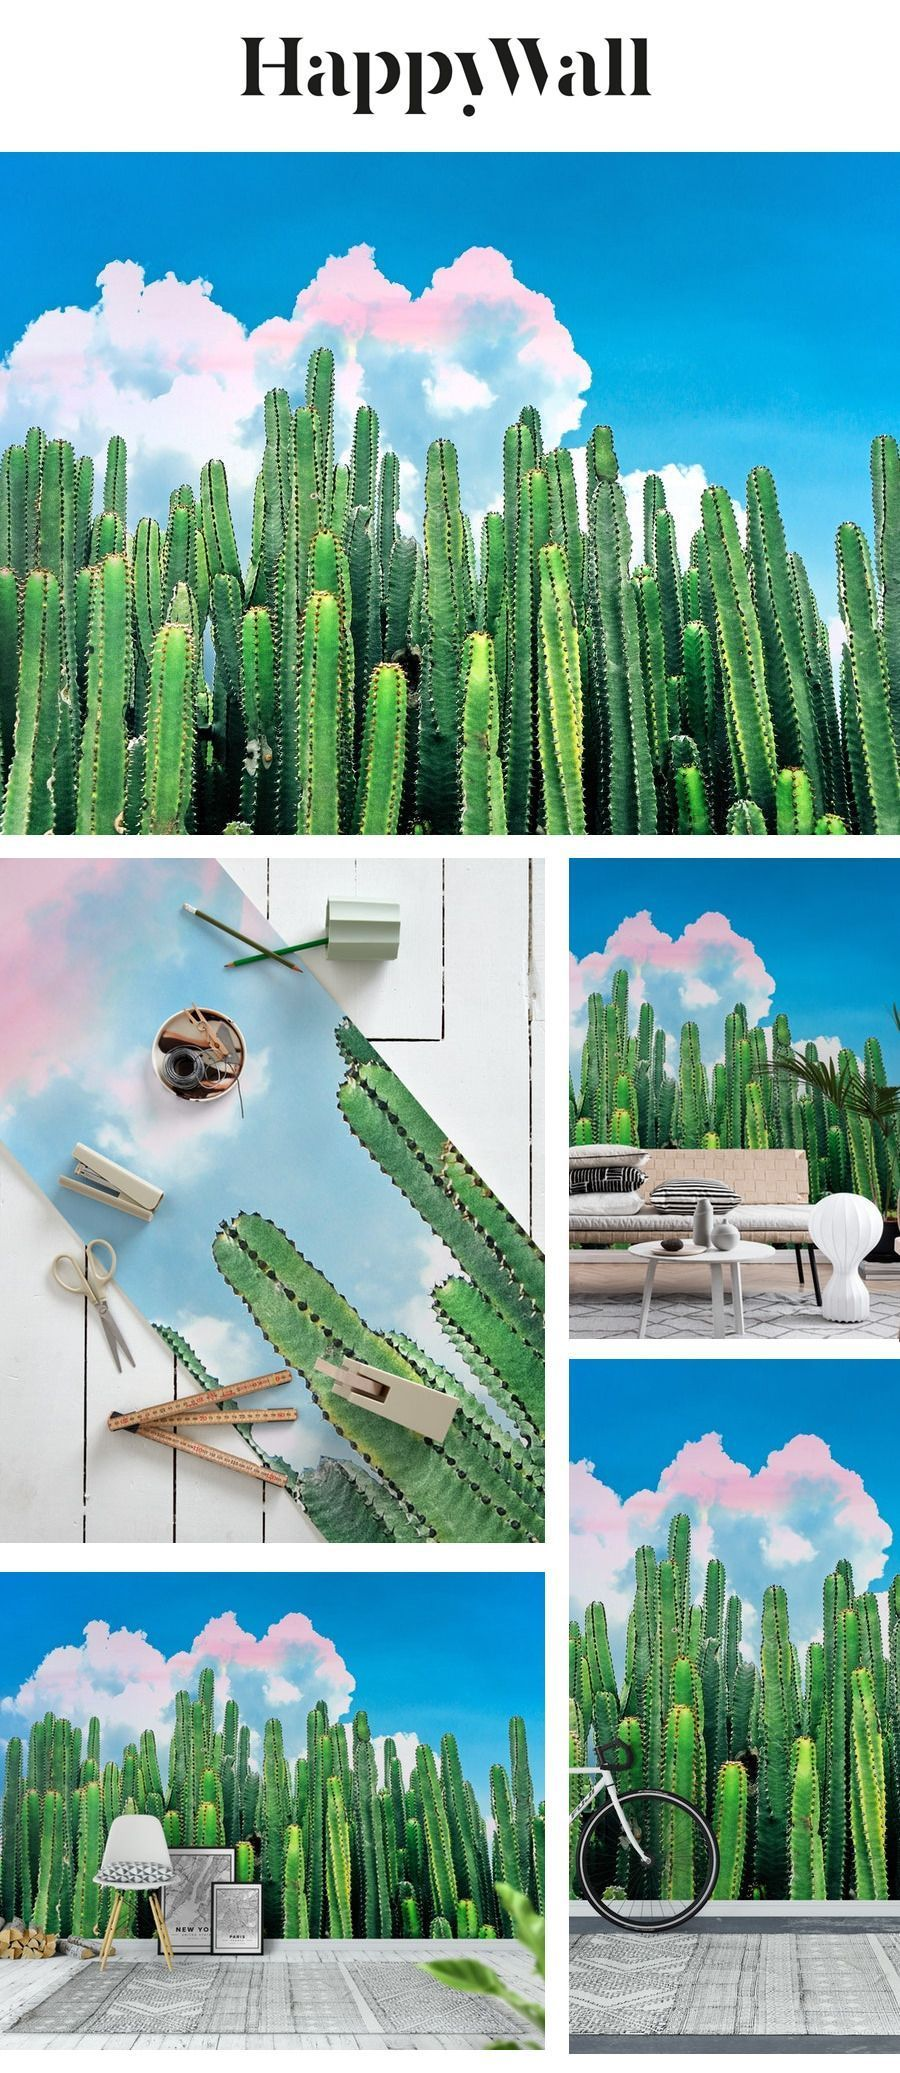 Cactus Summer Wallpaper#cactus #summer #wallpaper#cactus #summer #wallpaper #wallpapercactus